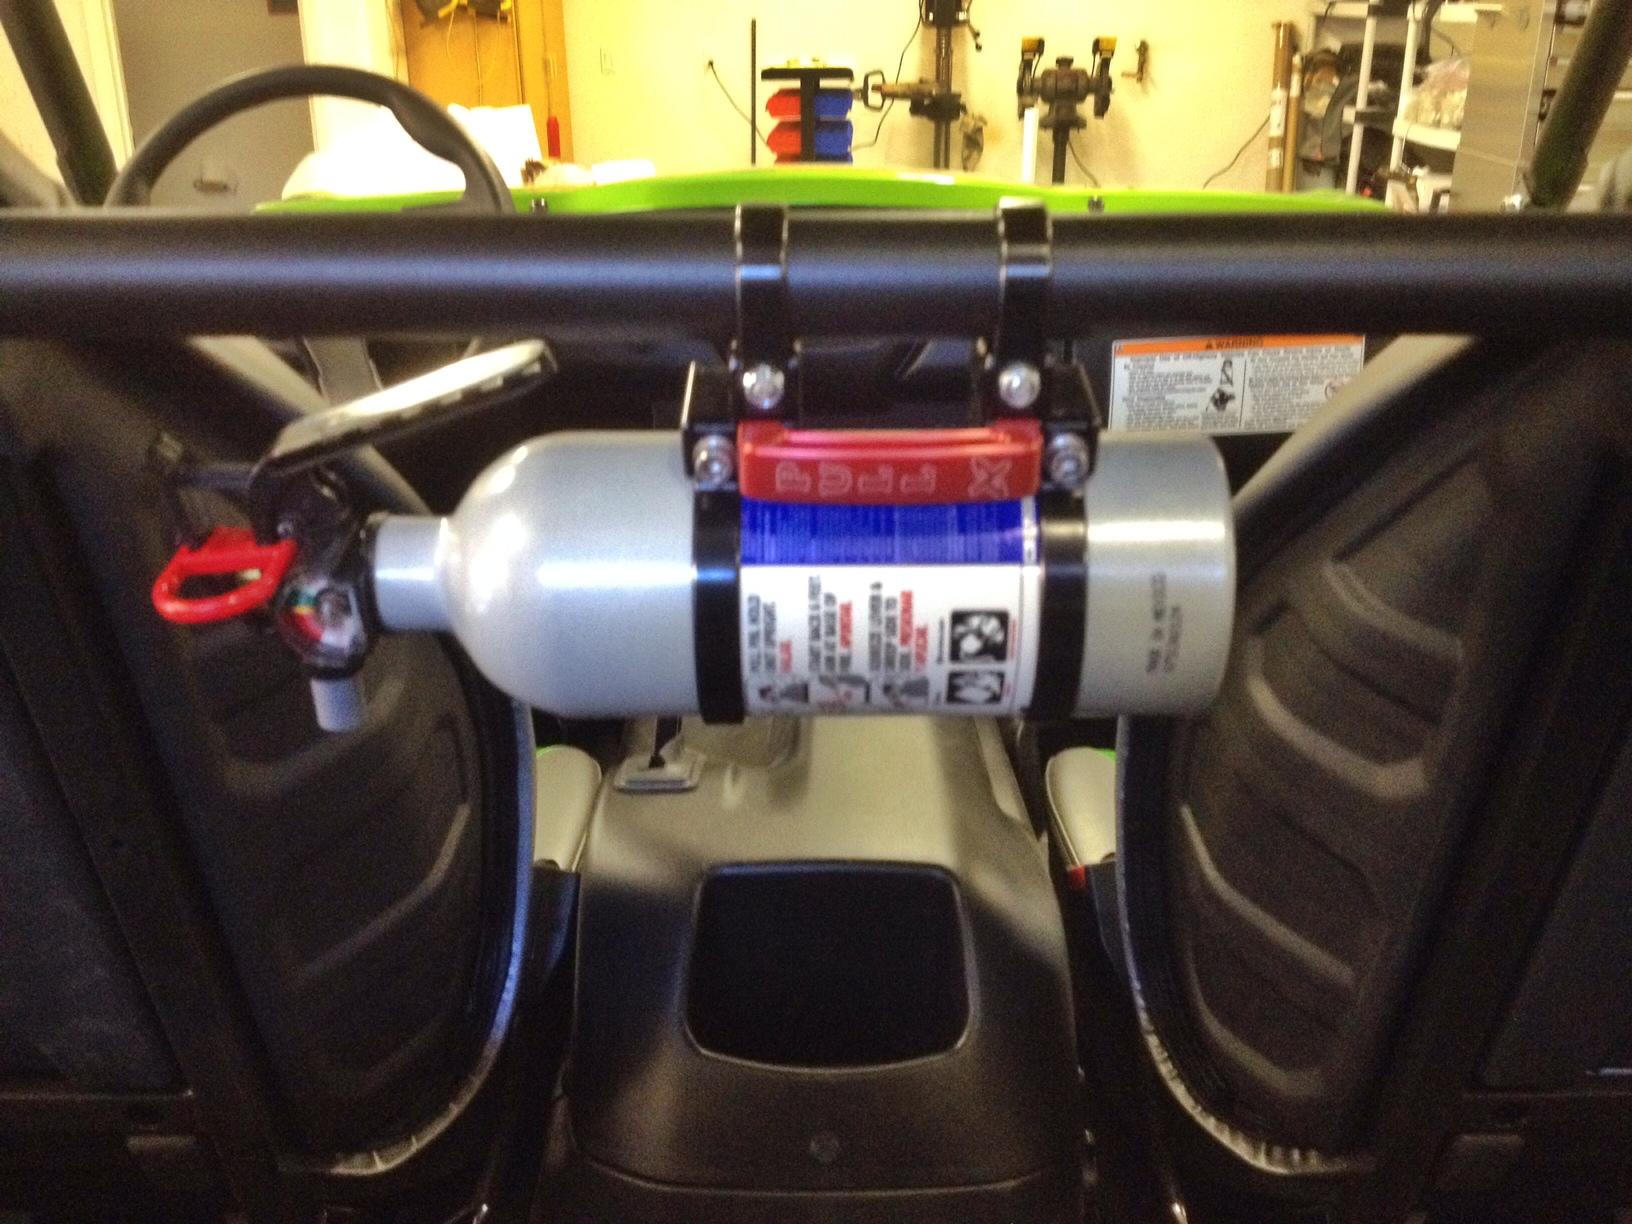 Rugged Power Steering Kit Cubcadet Power Steering Kit